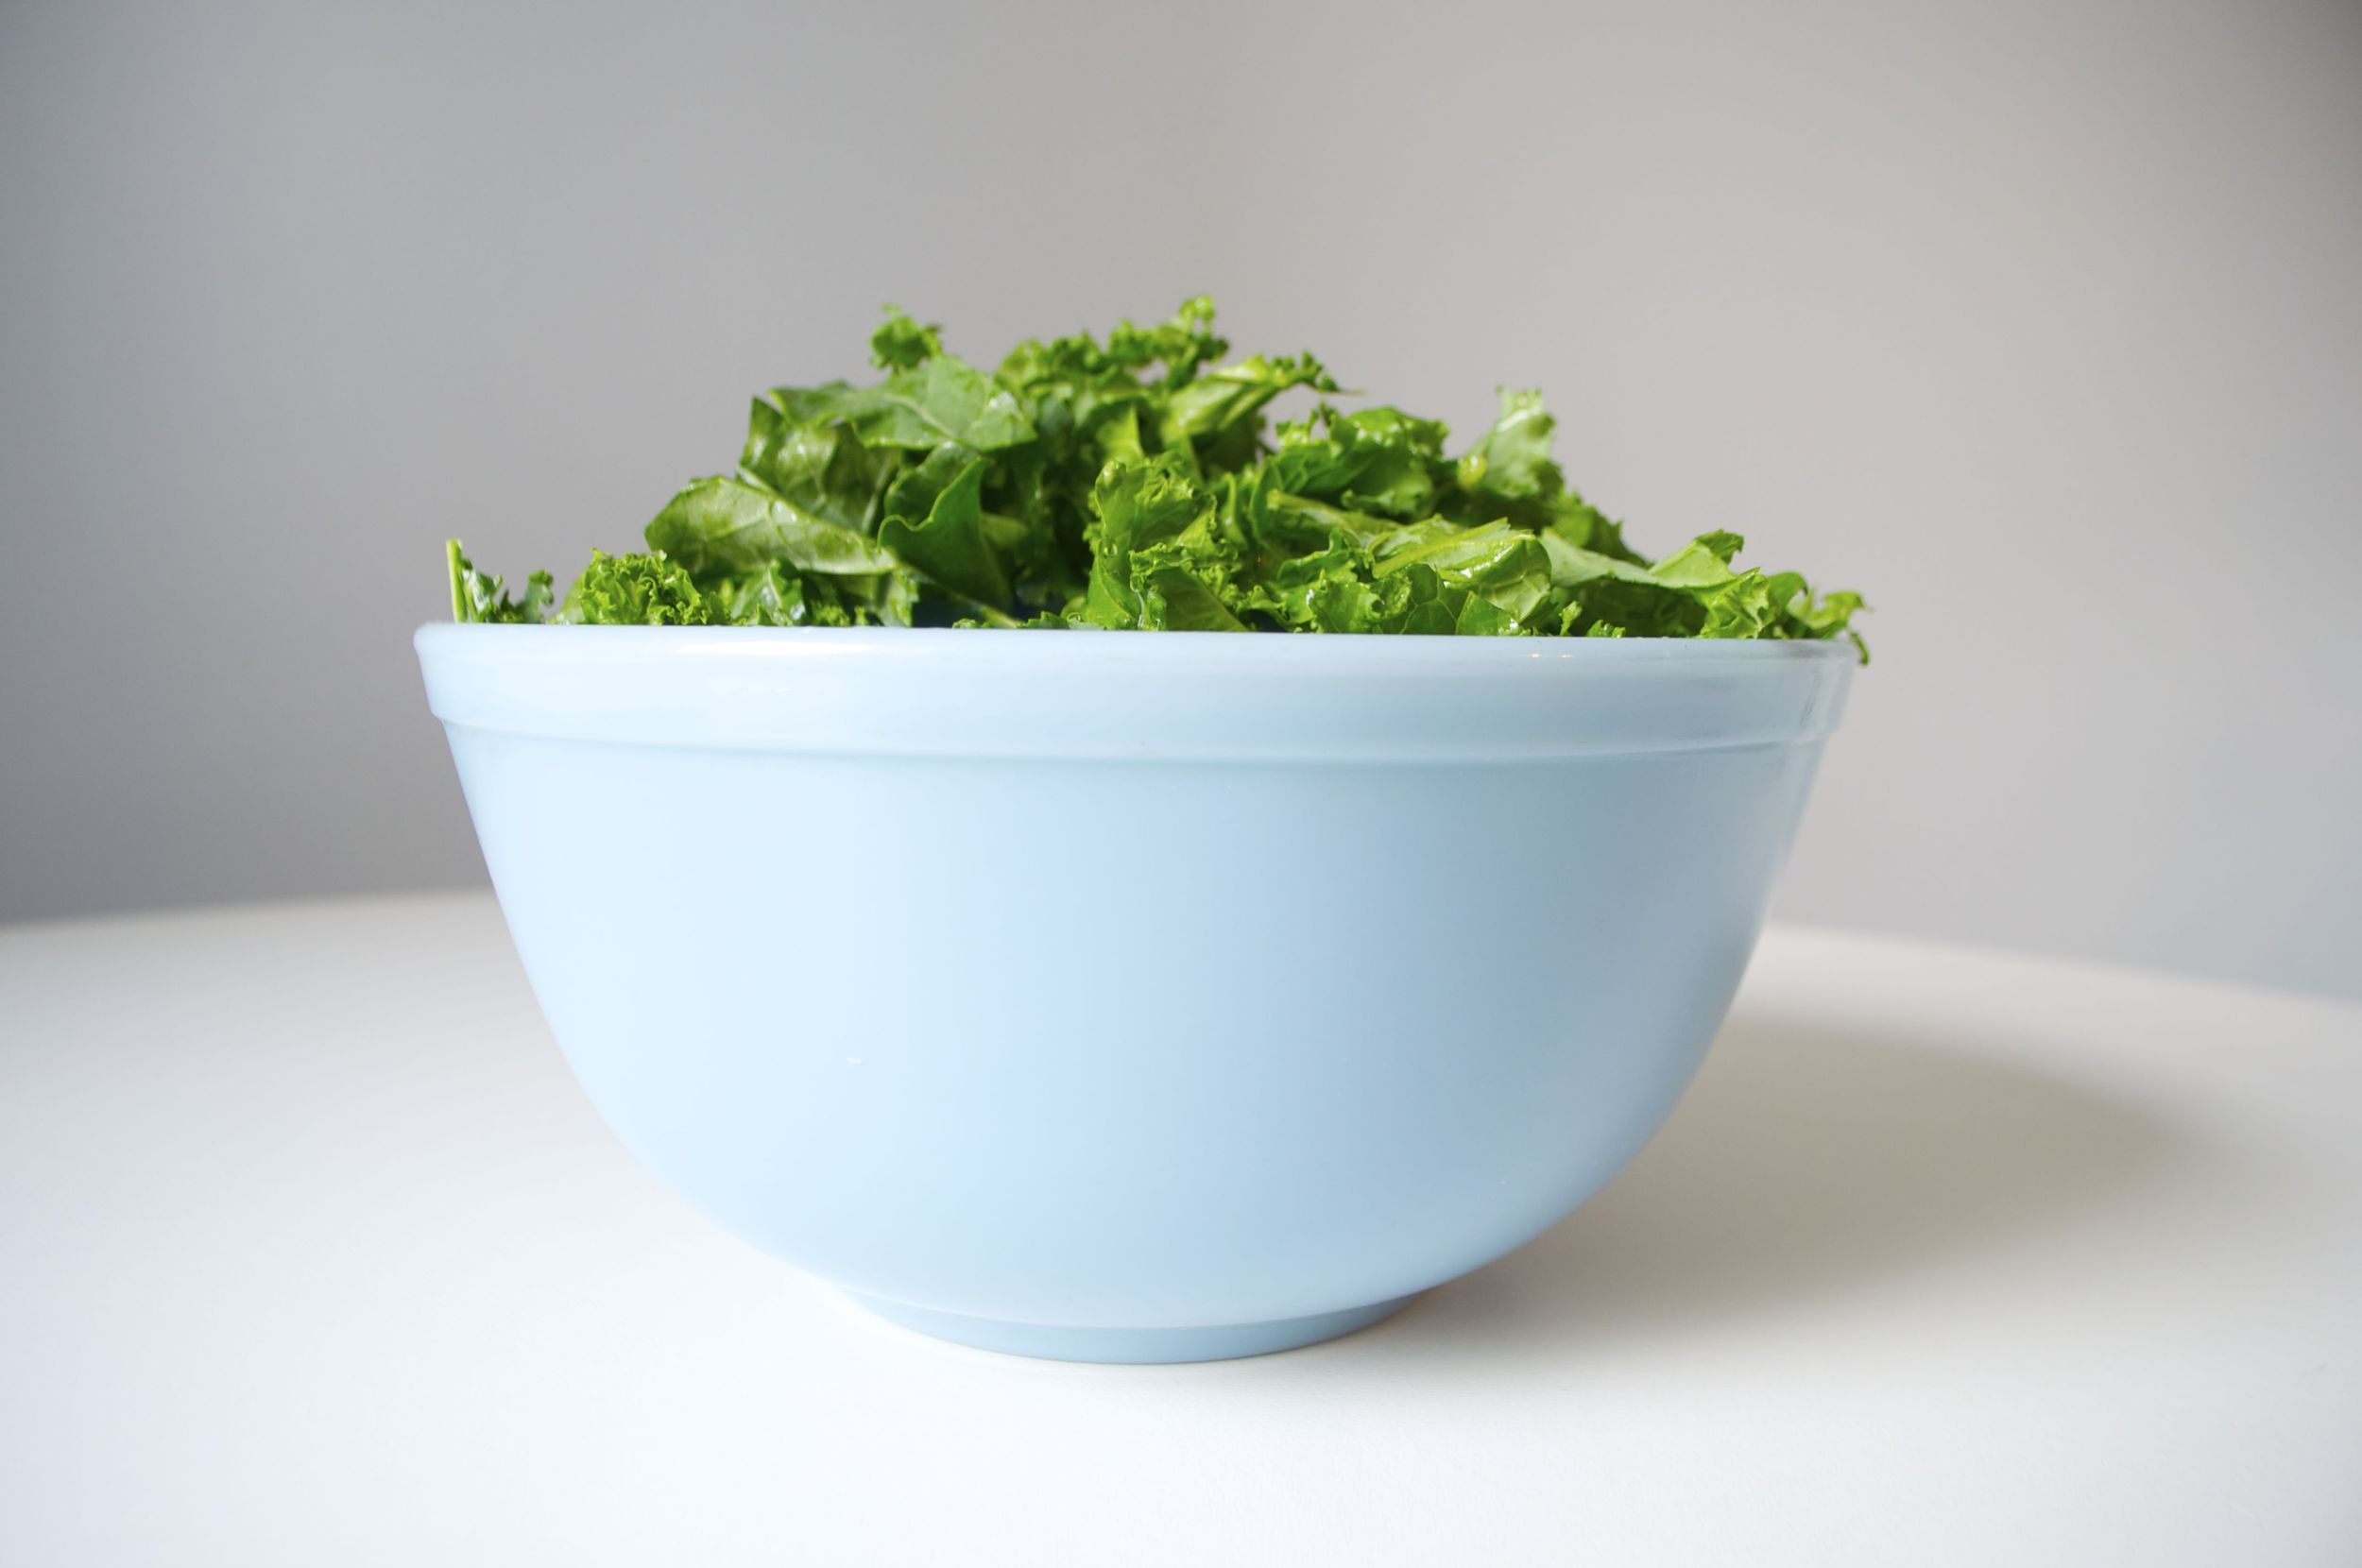 detox-avocado-kale-salad-fried-parsley